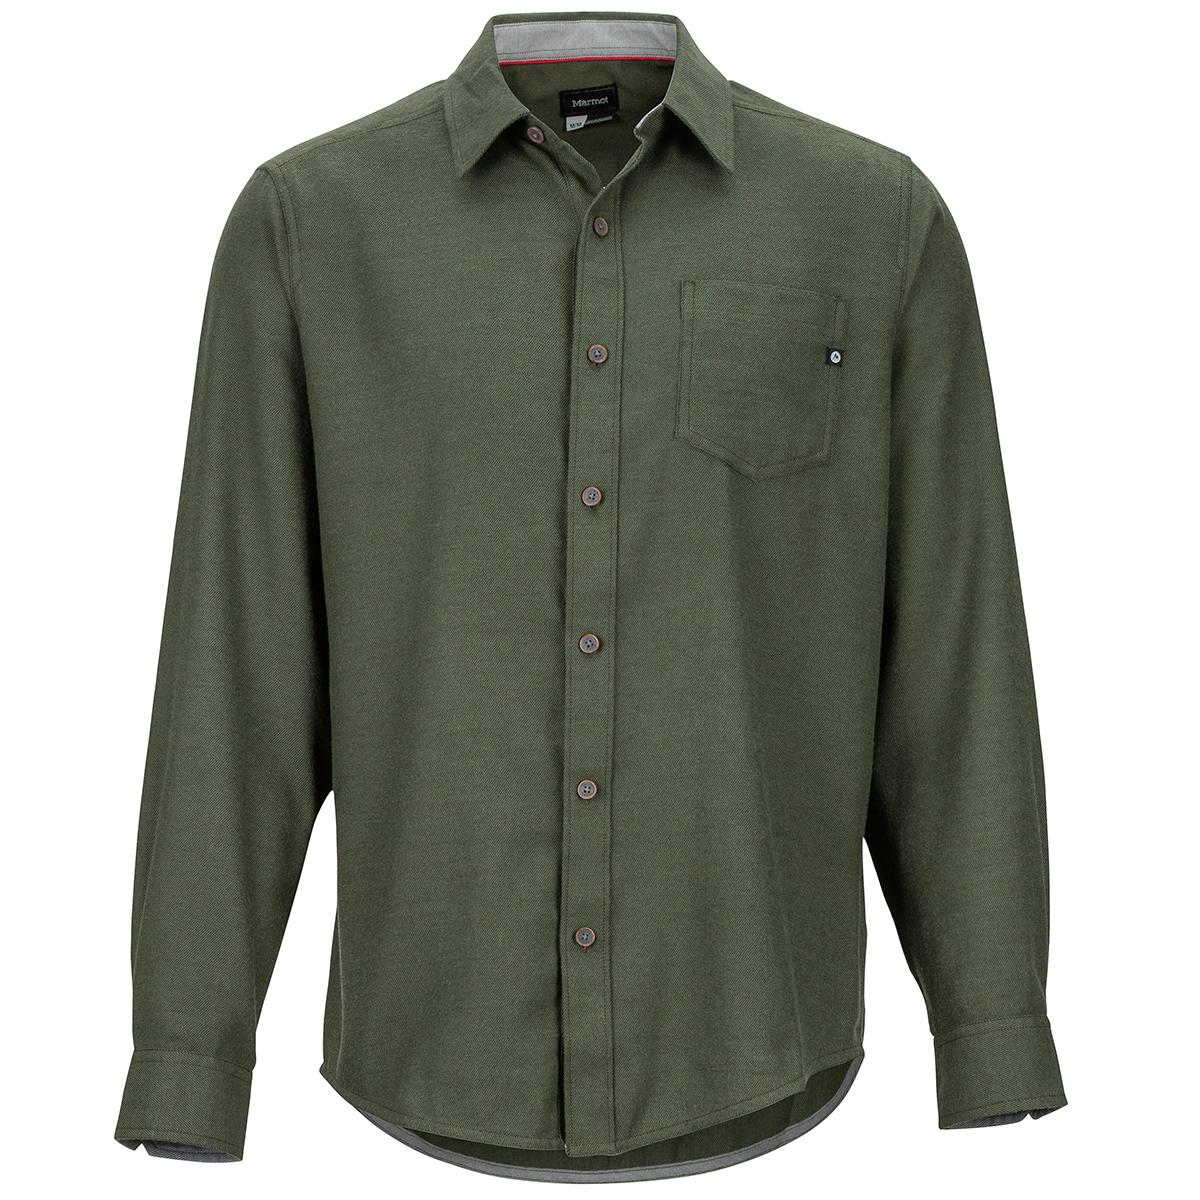 Marmot Men's Hobson Midweight Flannel Long-Sleeve Shirt - Green, M